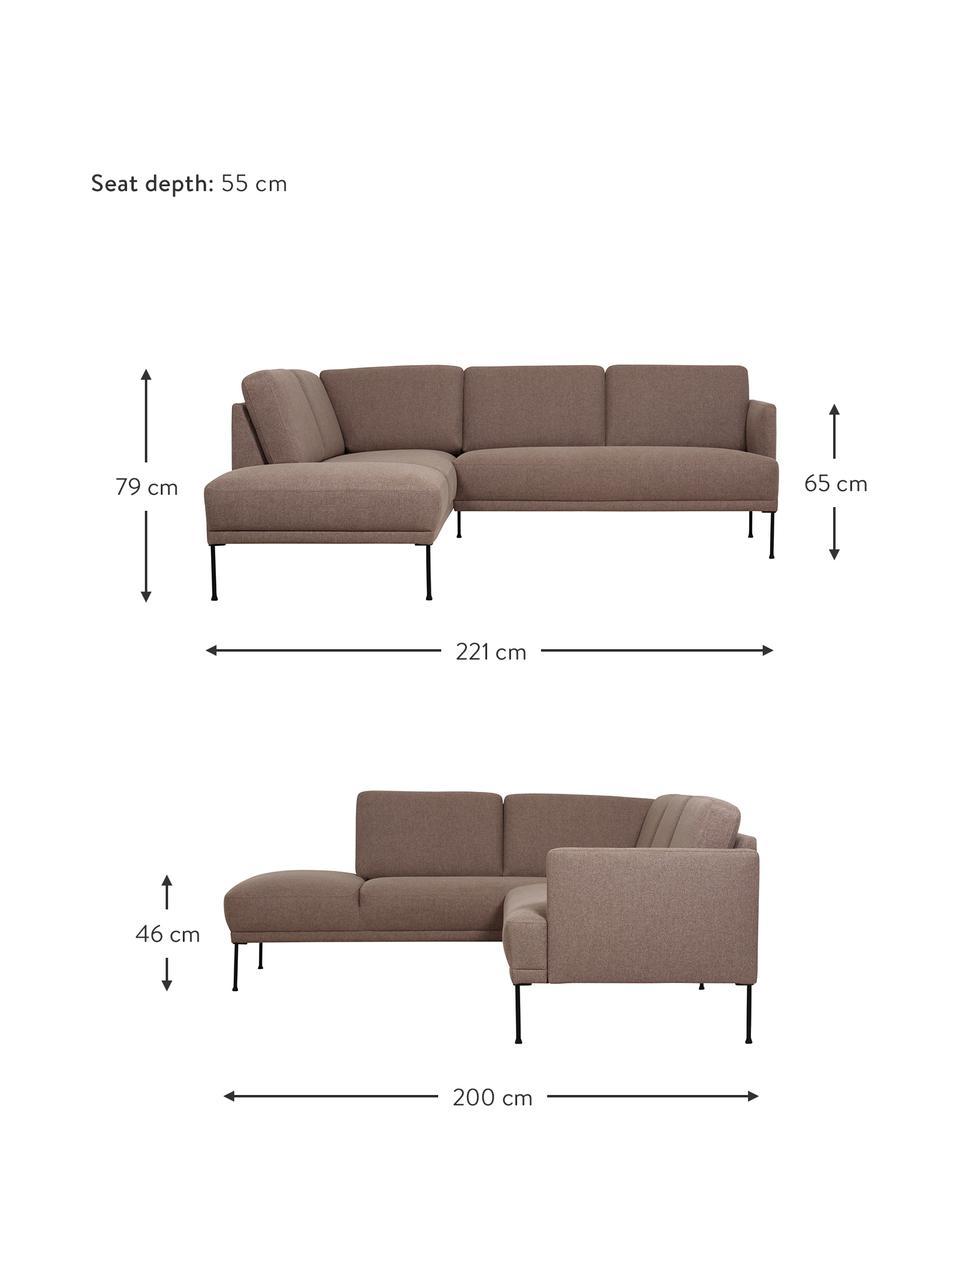 Hoekbank Fluente in bruin met metalen poten, Bekleding: 100% polyester, Frame: massief grenenhout, Geweven stof bruin, B 221 x D 200 cm